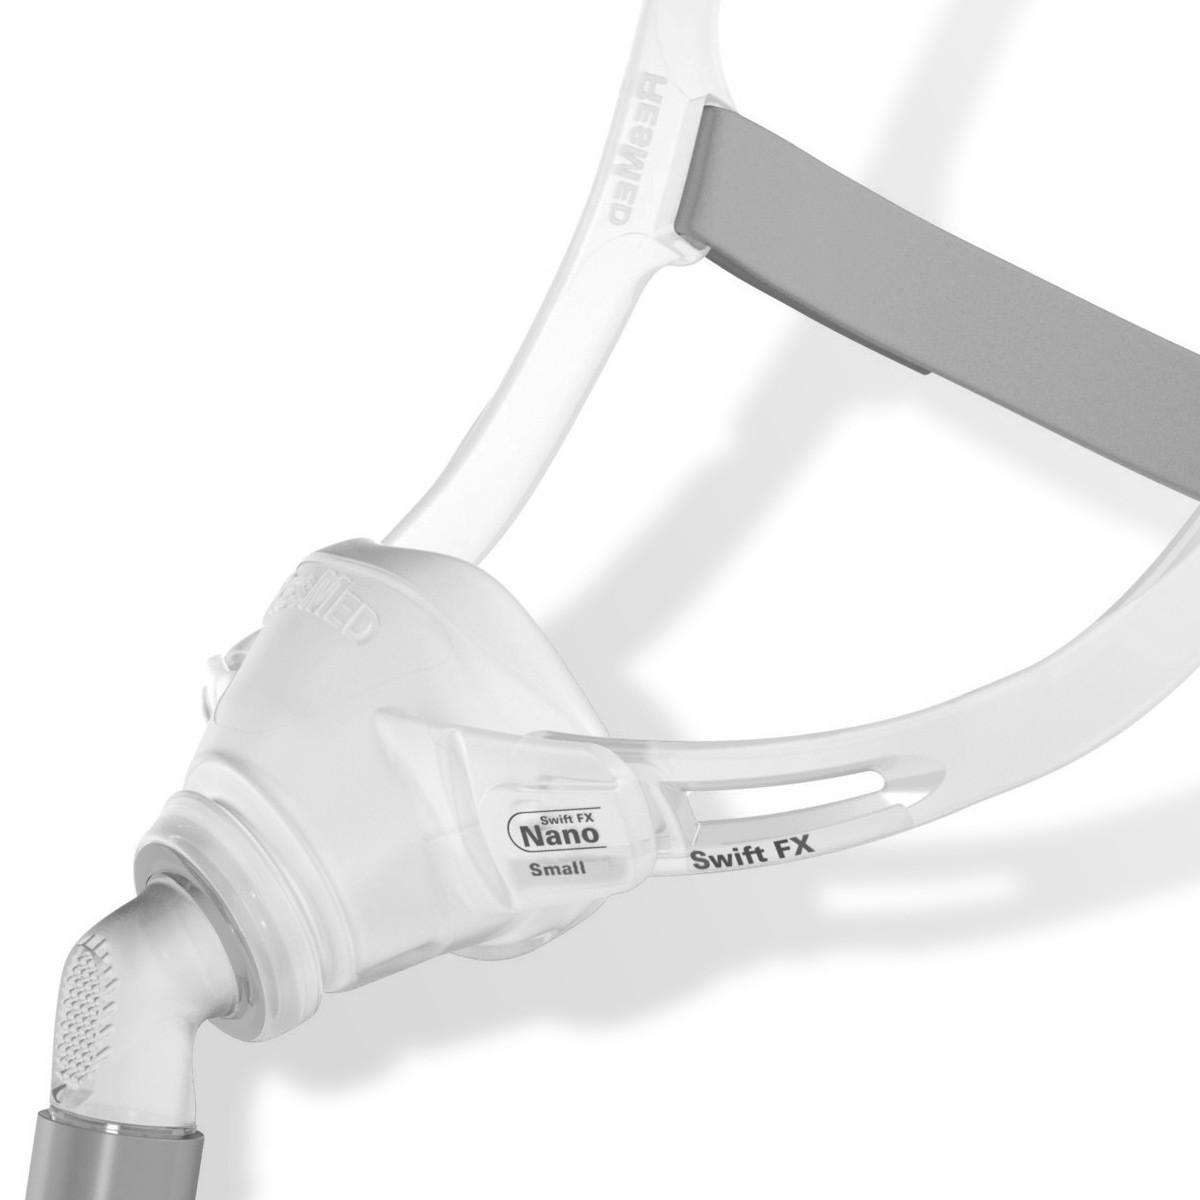 Swift FX Nano Nasal CPAP Mask with Headgear